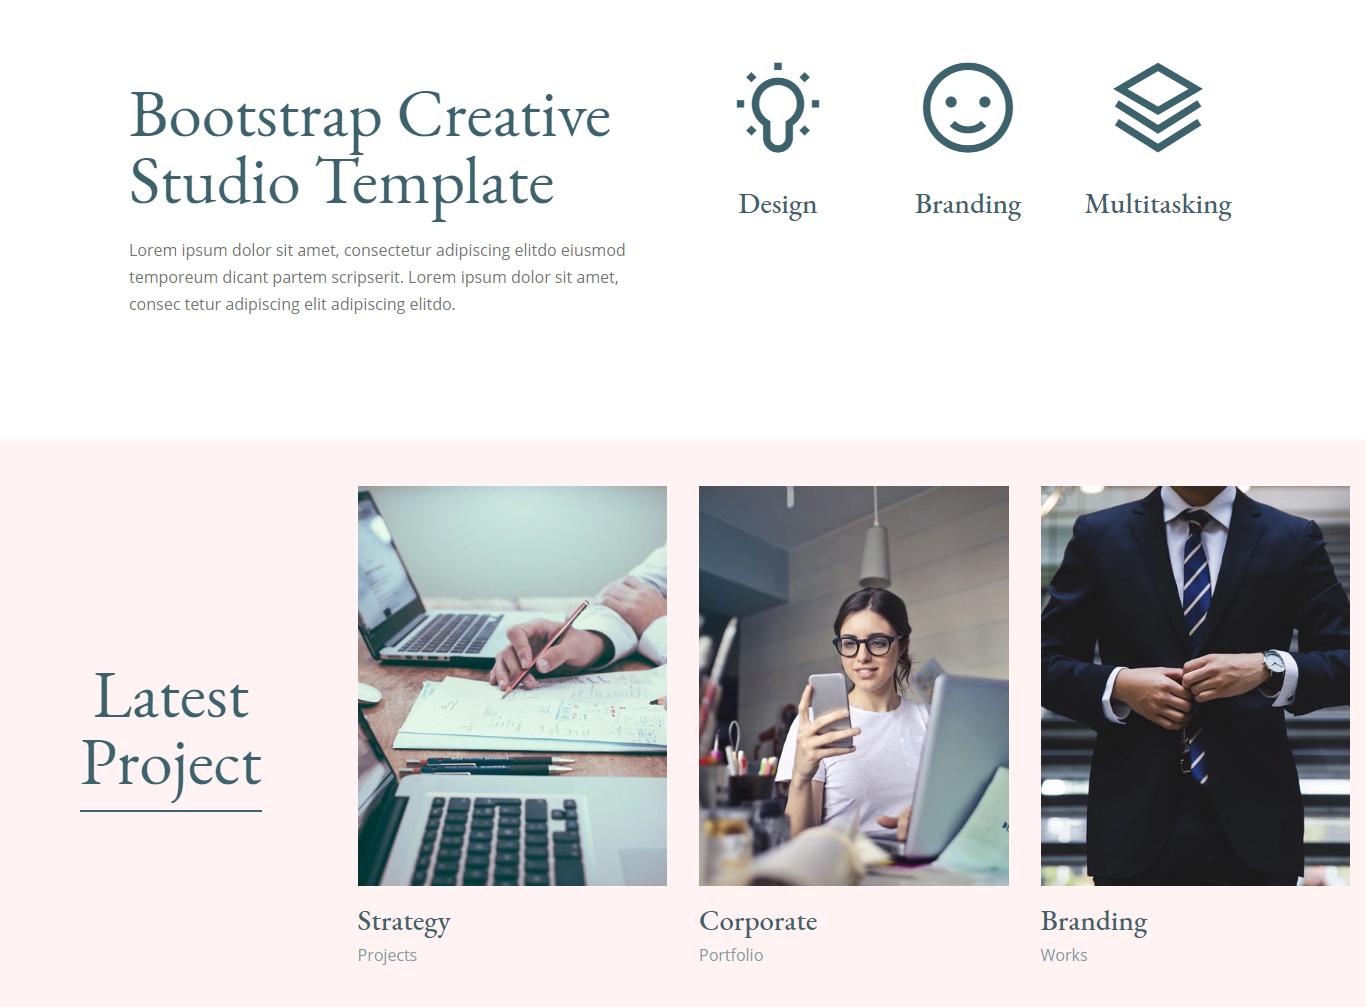 HTML5 Bootstrap Creative Studio Template